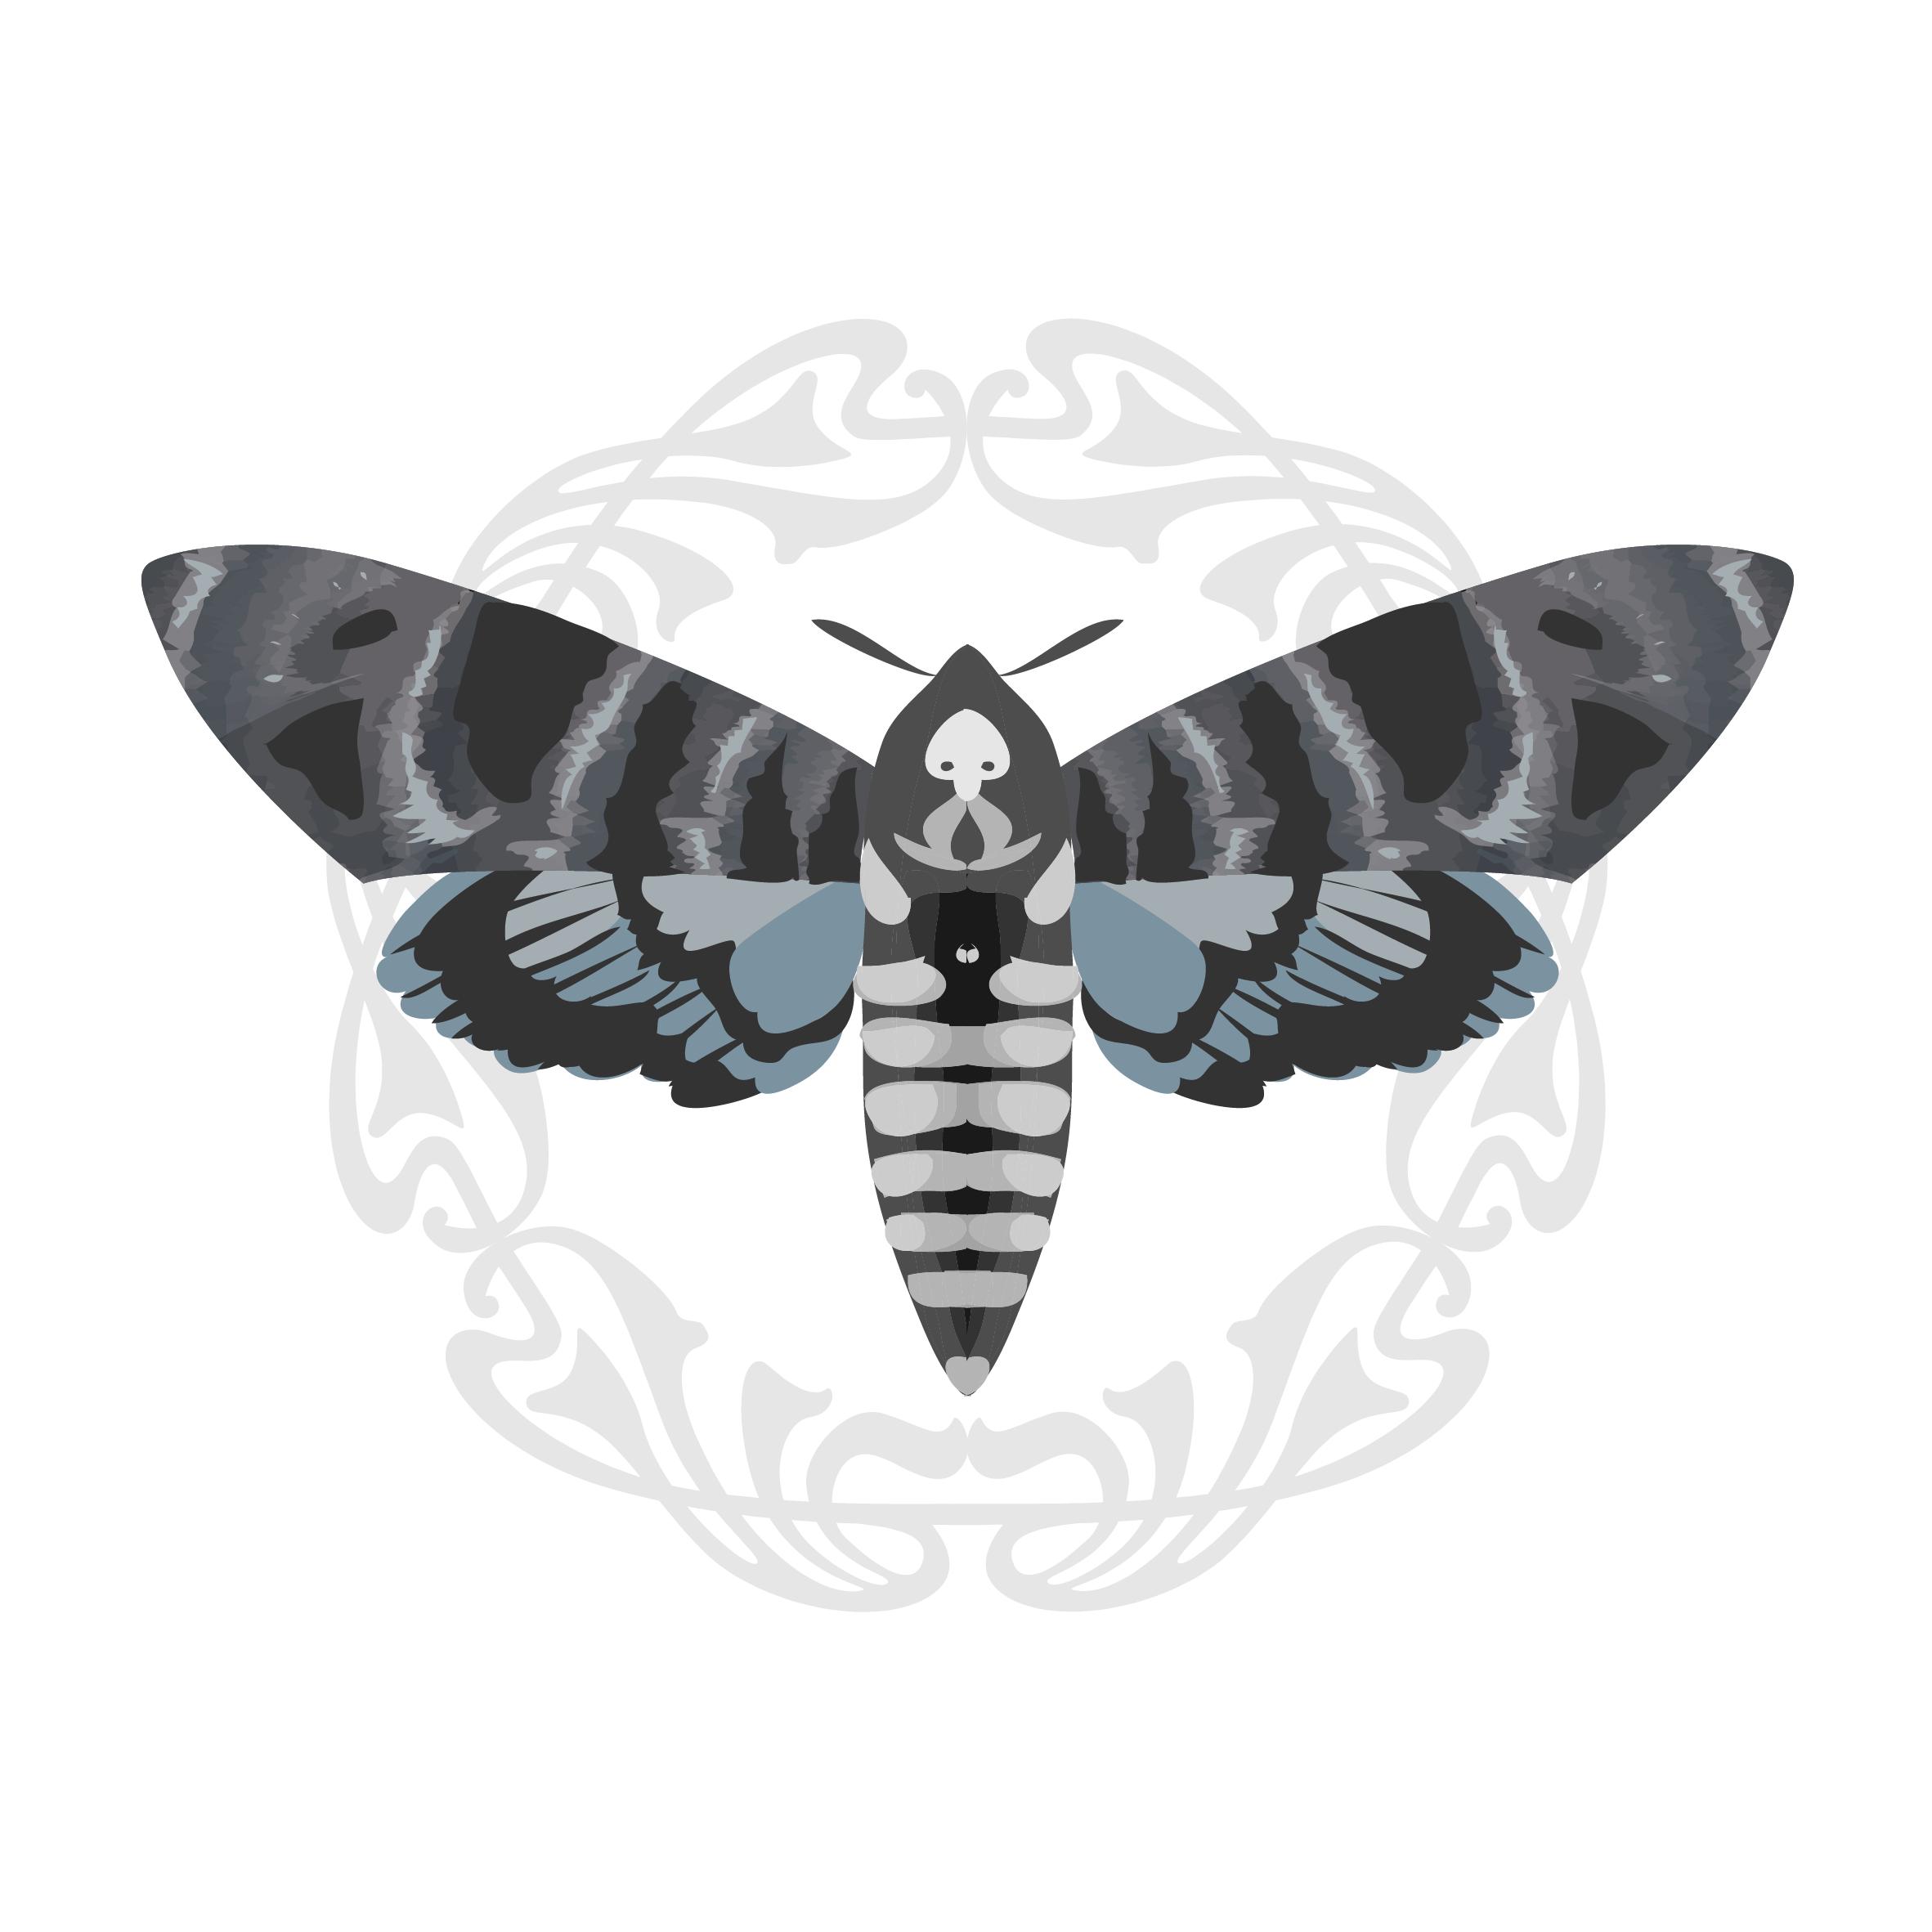 19. Moth